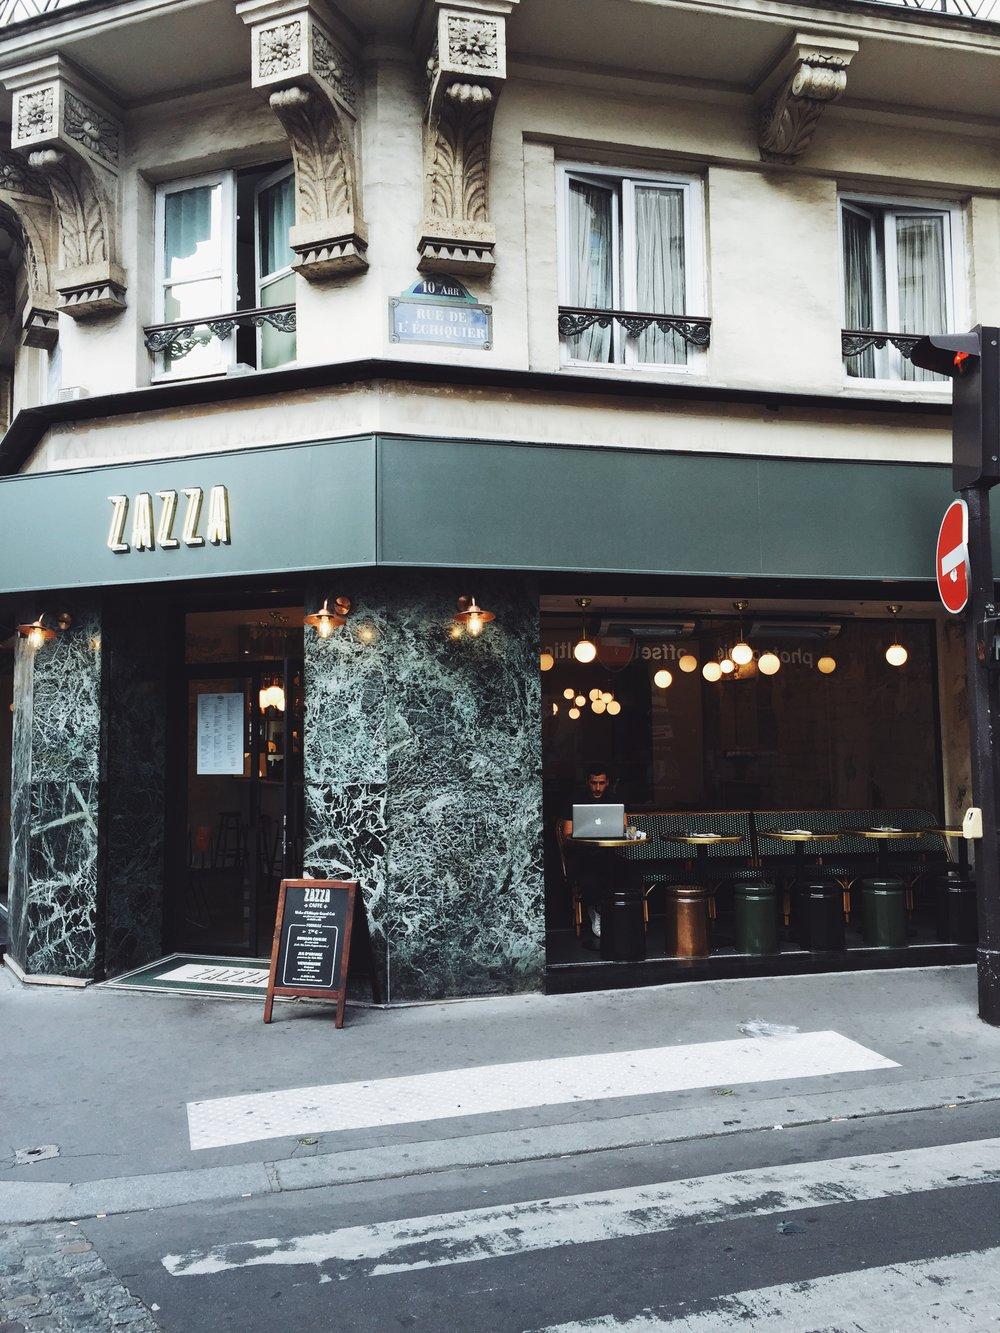 Café+Zazza+Paris.jpeg